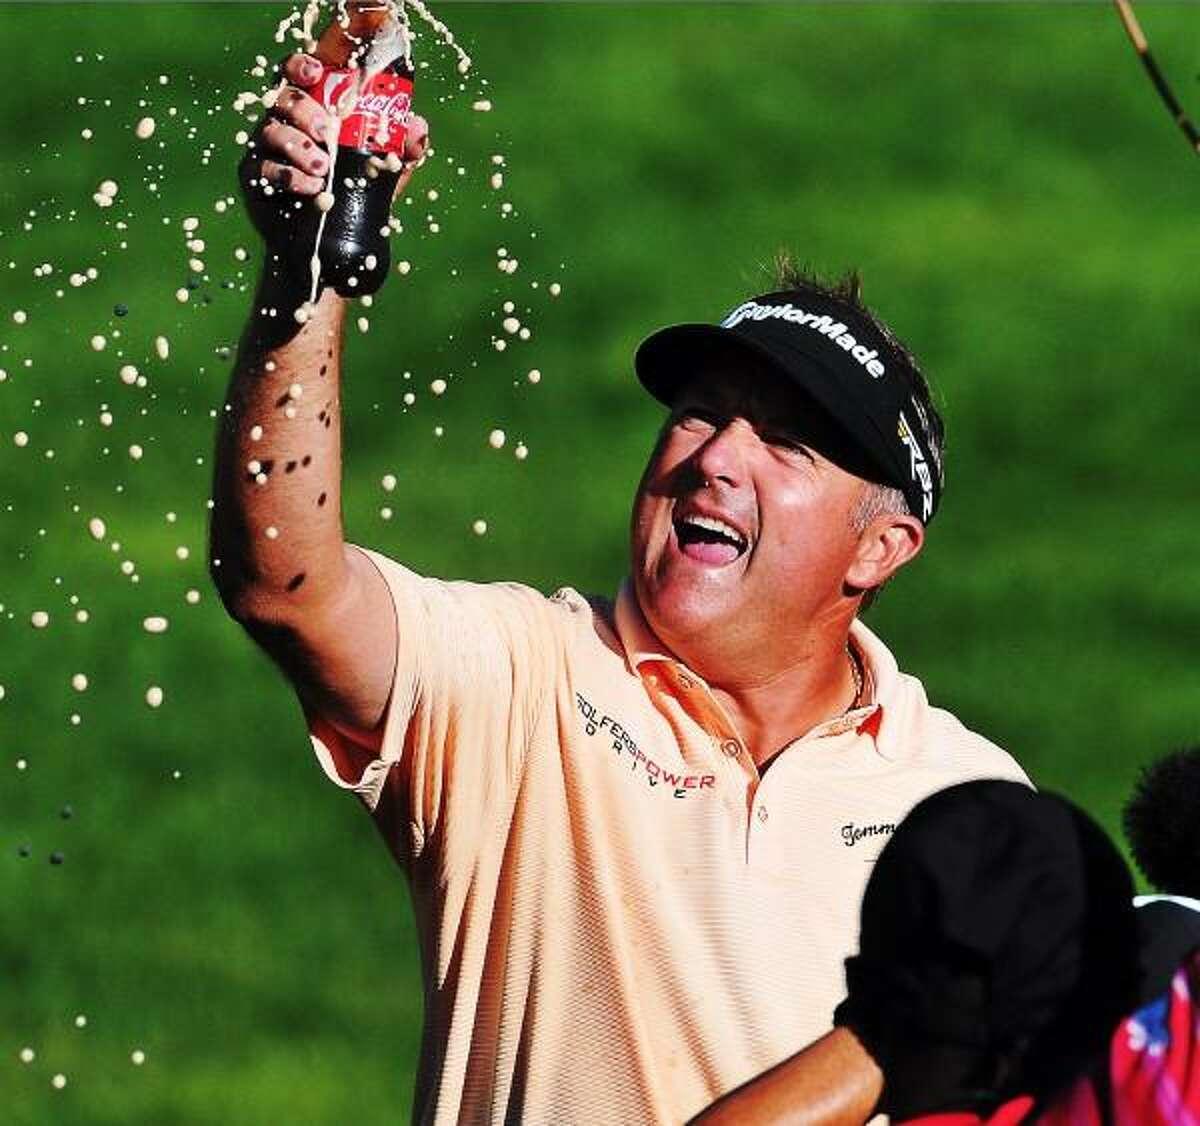 Peter Casolino â?? June 23, 2013- Ken Duke pops open a coke after shaking it up, moments after winning the 2013 Travelers Championship. pcasolino@newhavenregister.com